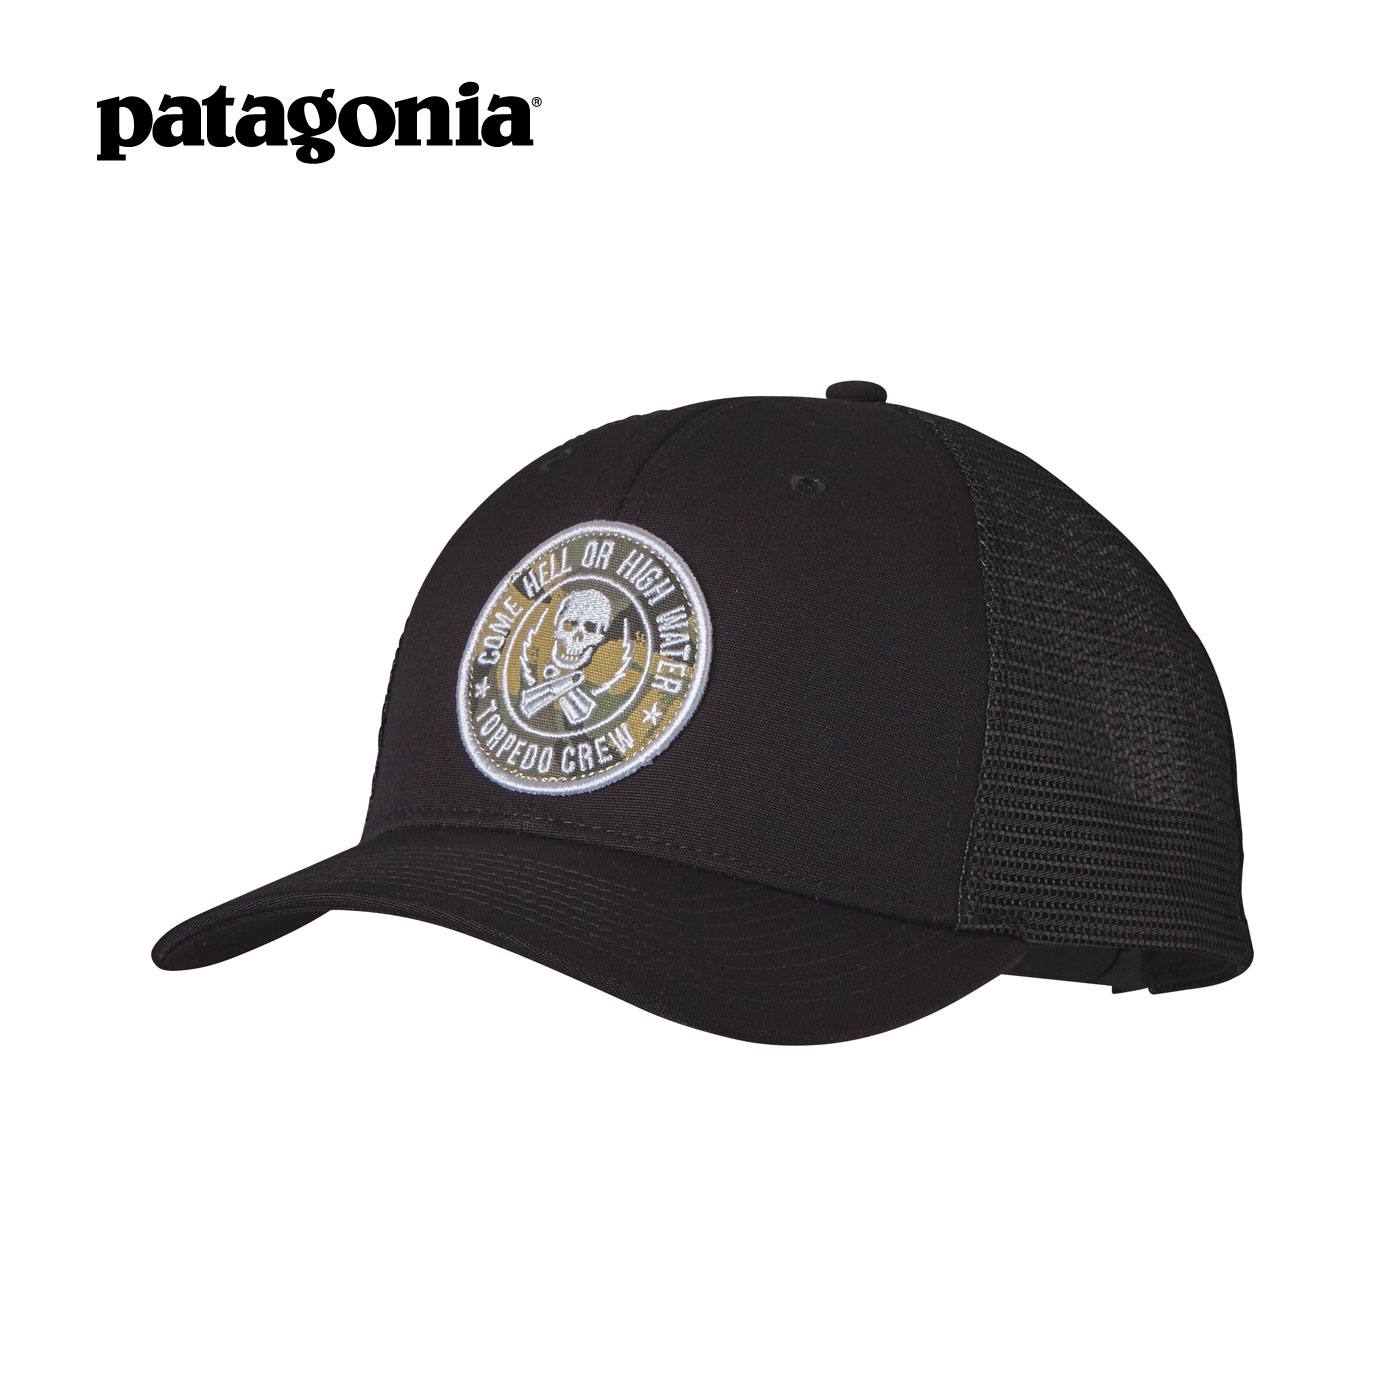 Get Quotations · Torpedo crew-patagonia trucker hat unisex baseball cap sun  hat logo bb59b15c774a